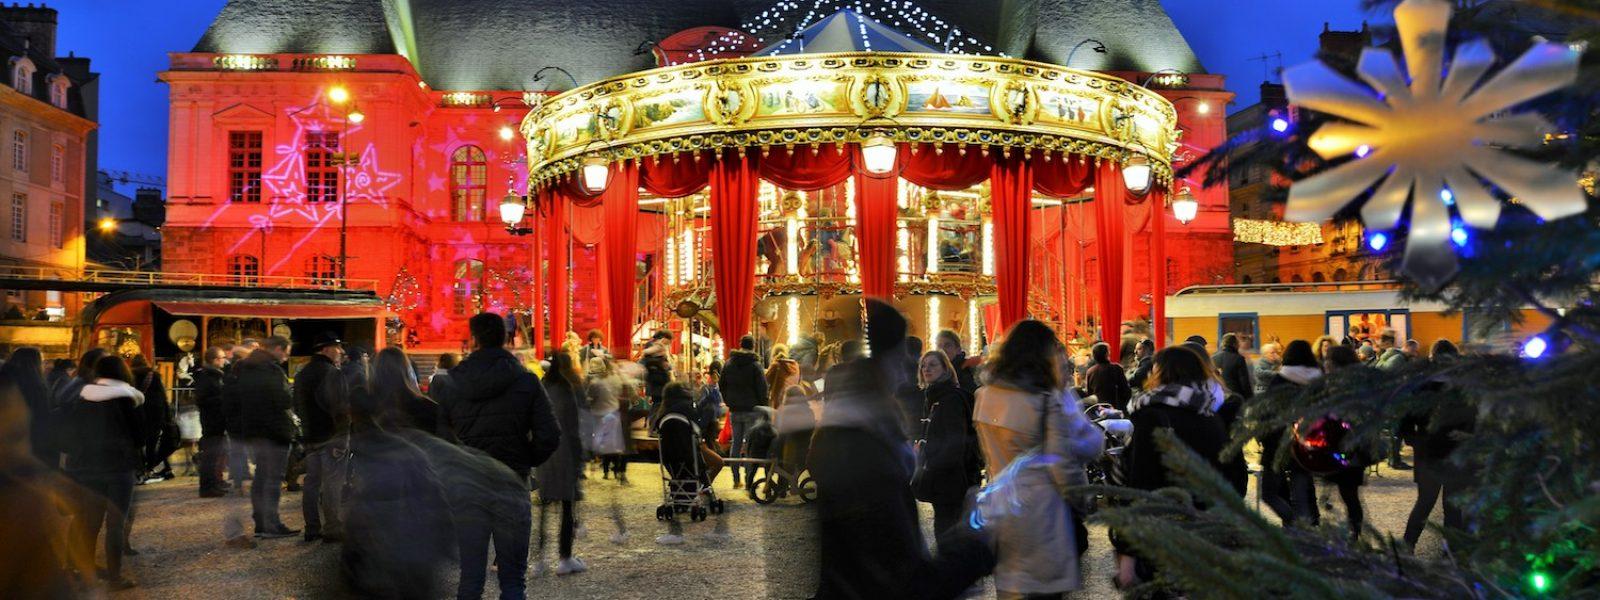 Rennes s'illumine et s'anime